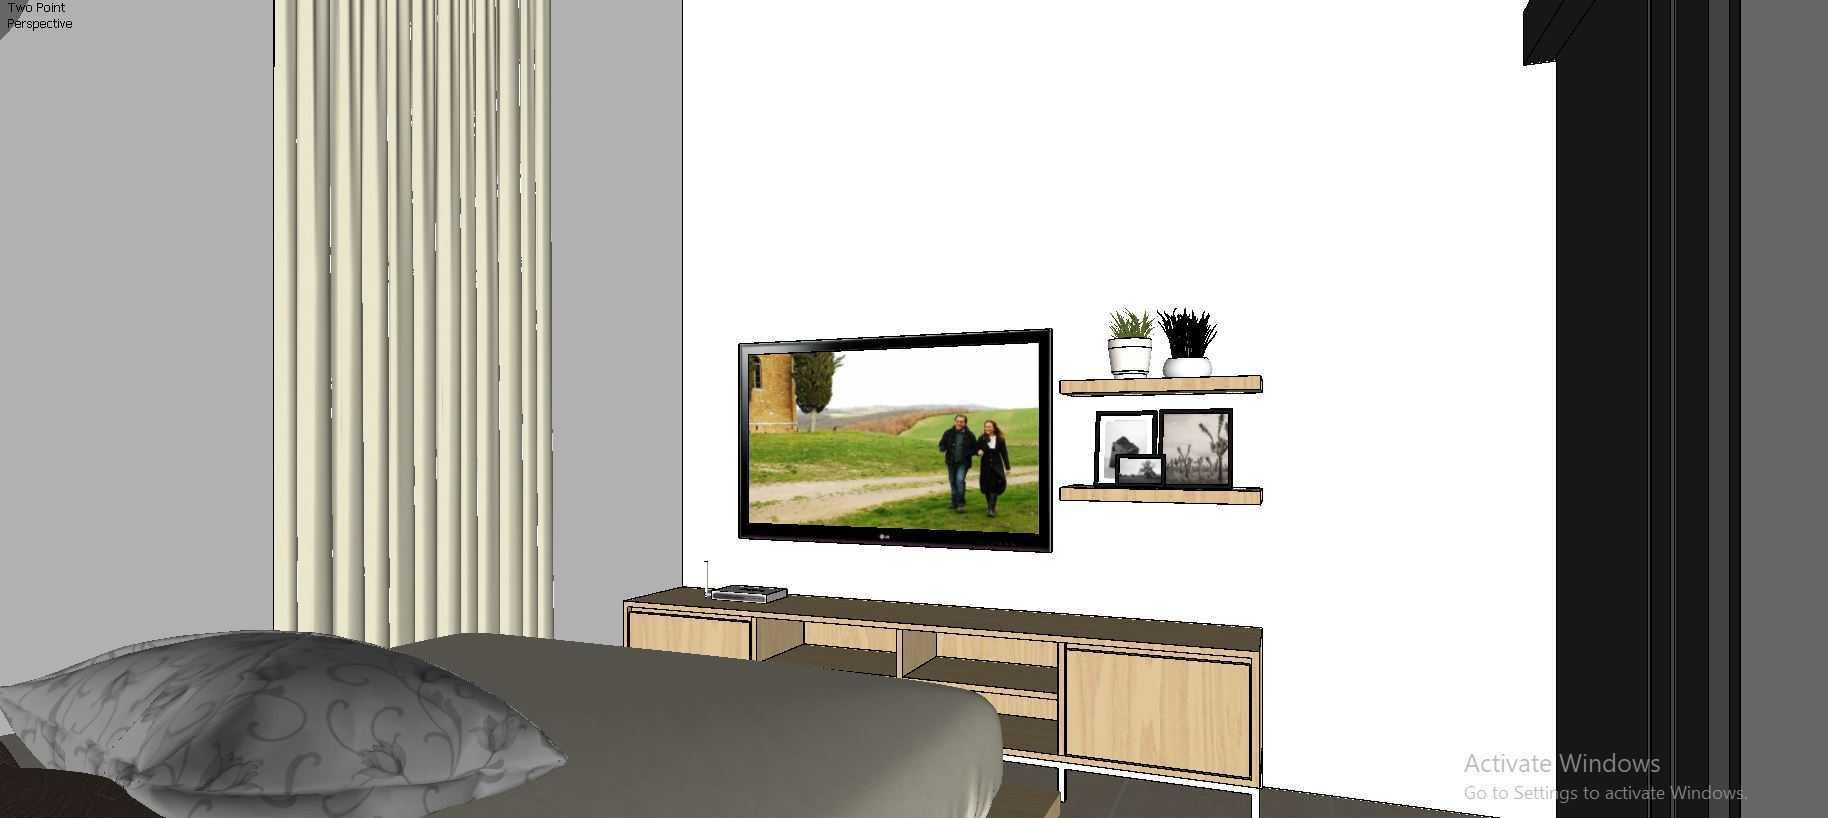 Arta Studio Billa's House Kec. Sawangan, Kota Depok, Jawa Barat, Indonesia Kec. Sawangan, Kota Depok, Jawa Barat, Indonesia Arief-Muhammad-Nasution-Billas-House   108276